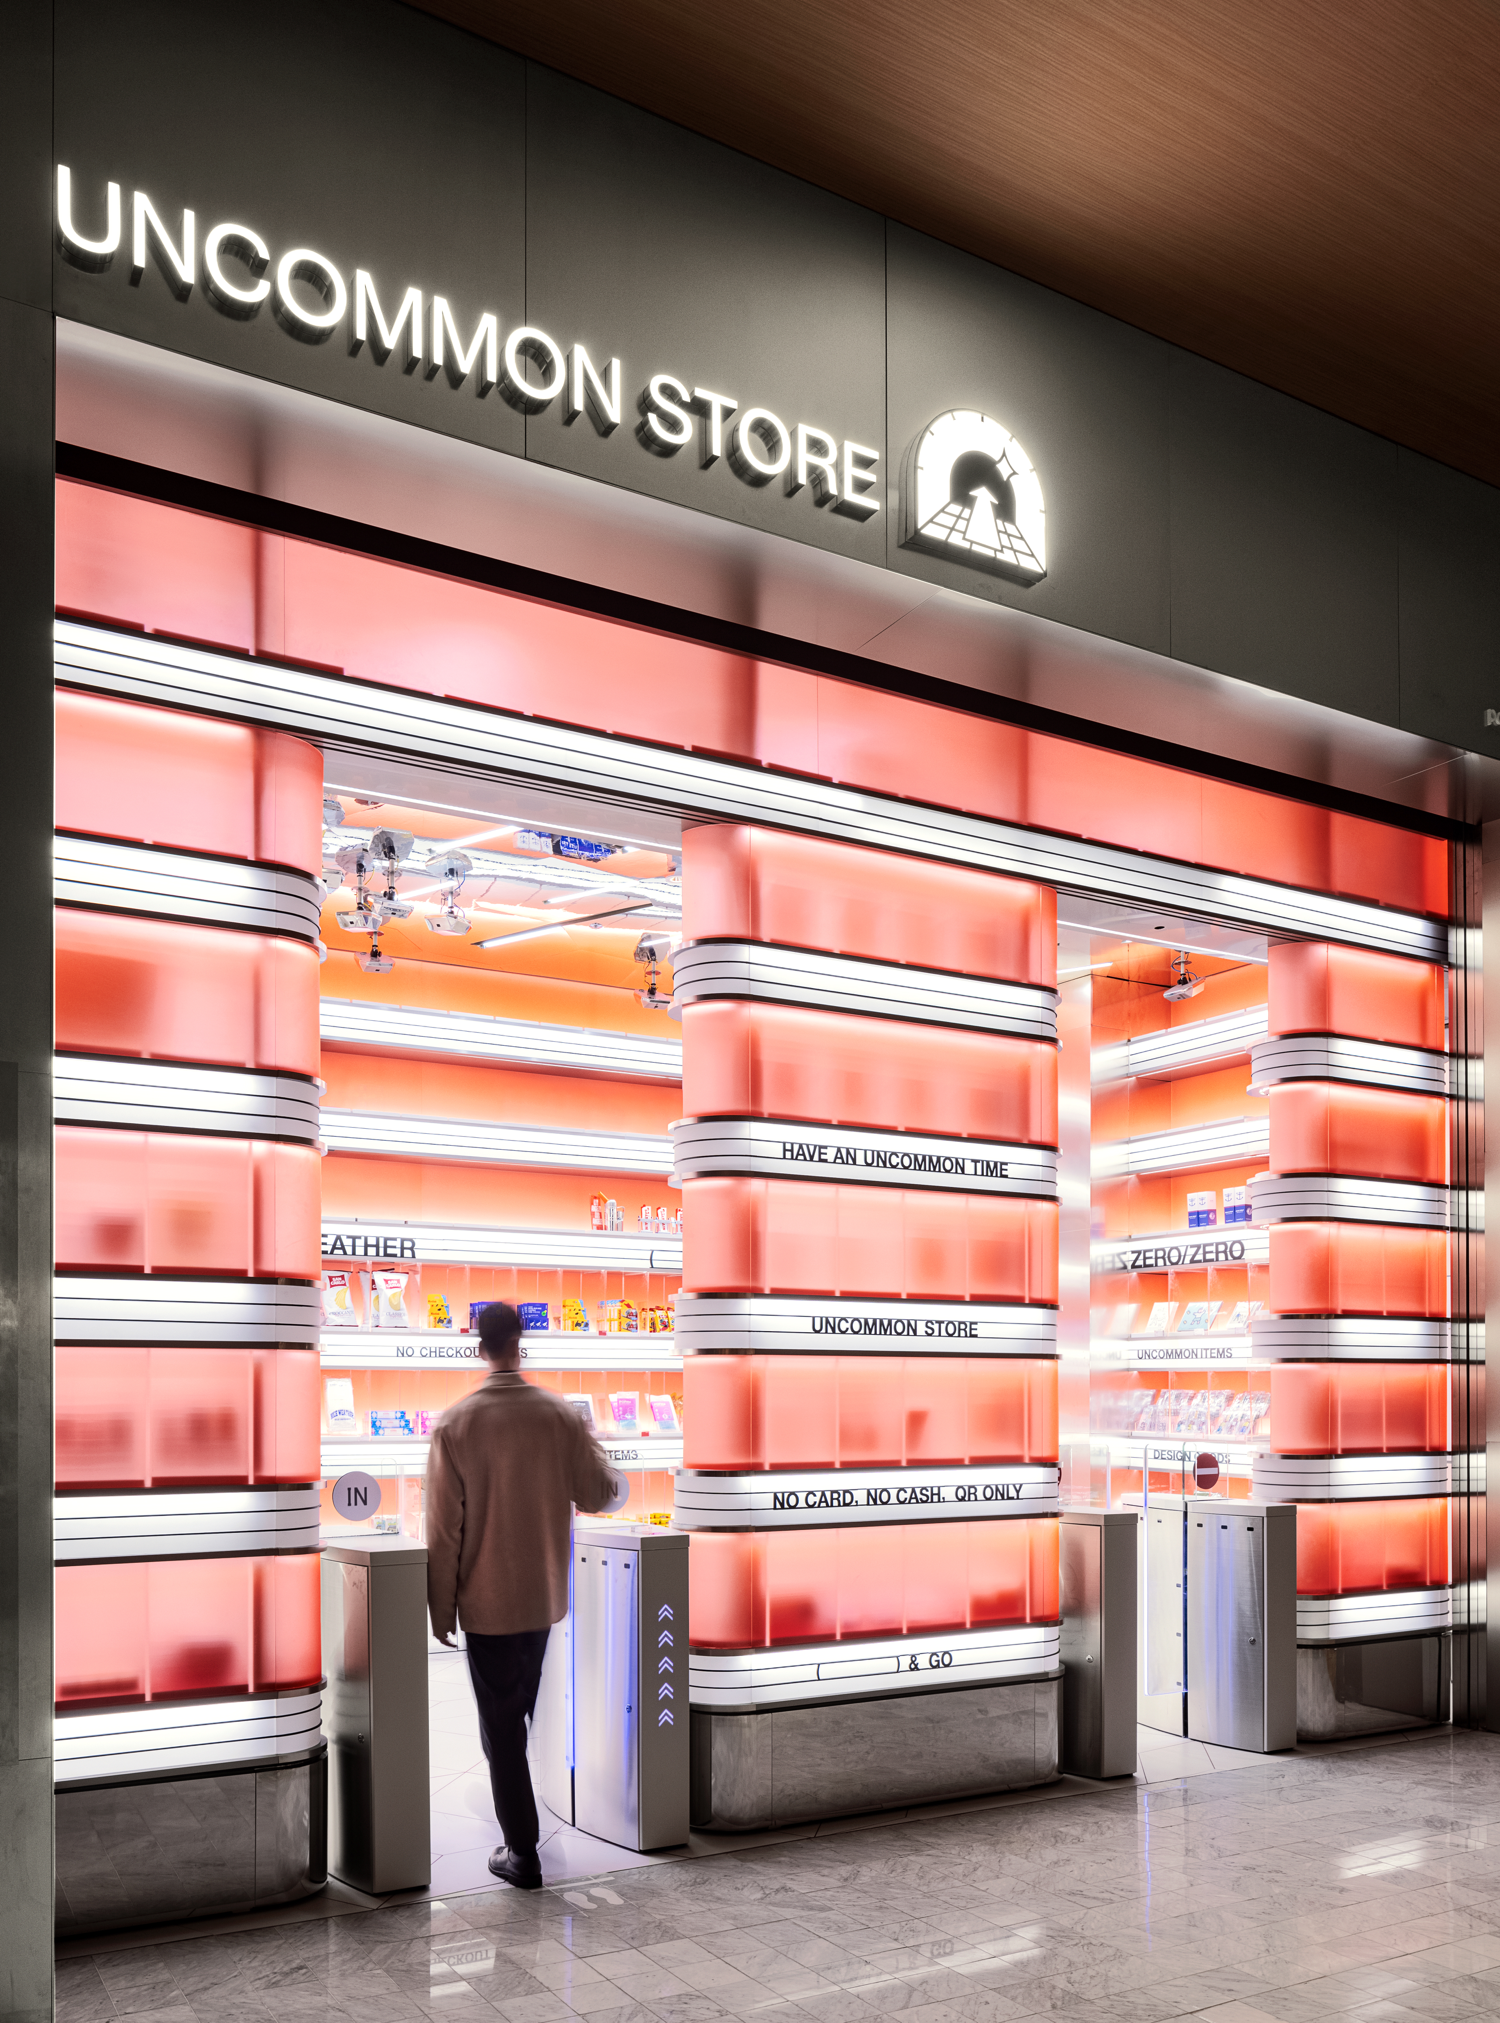 Seoul: Uncommon Store opening